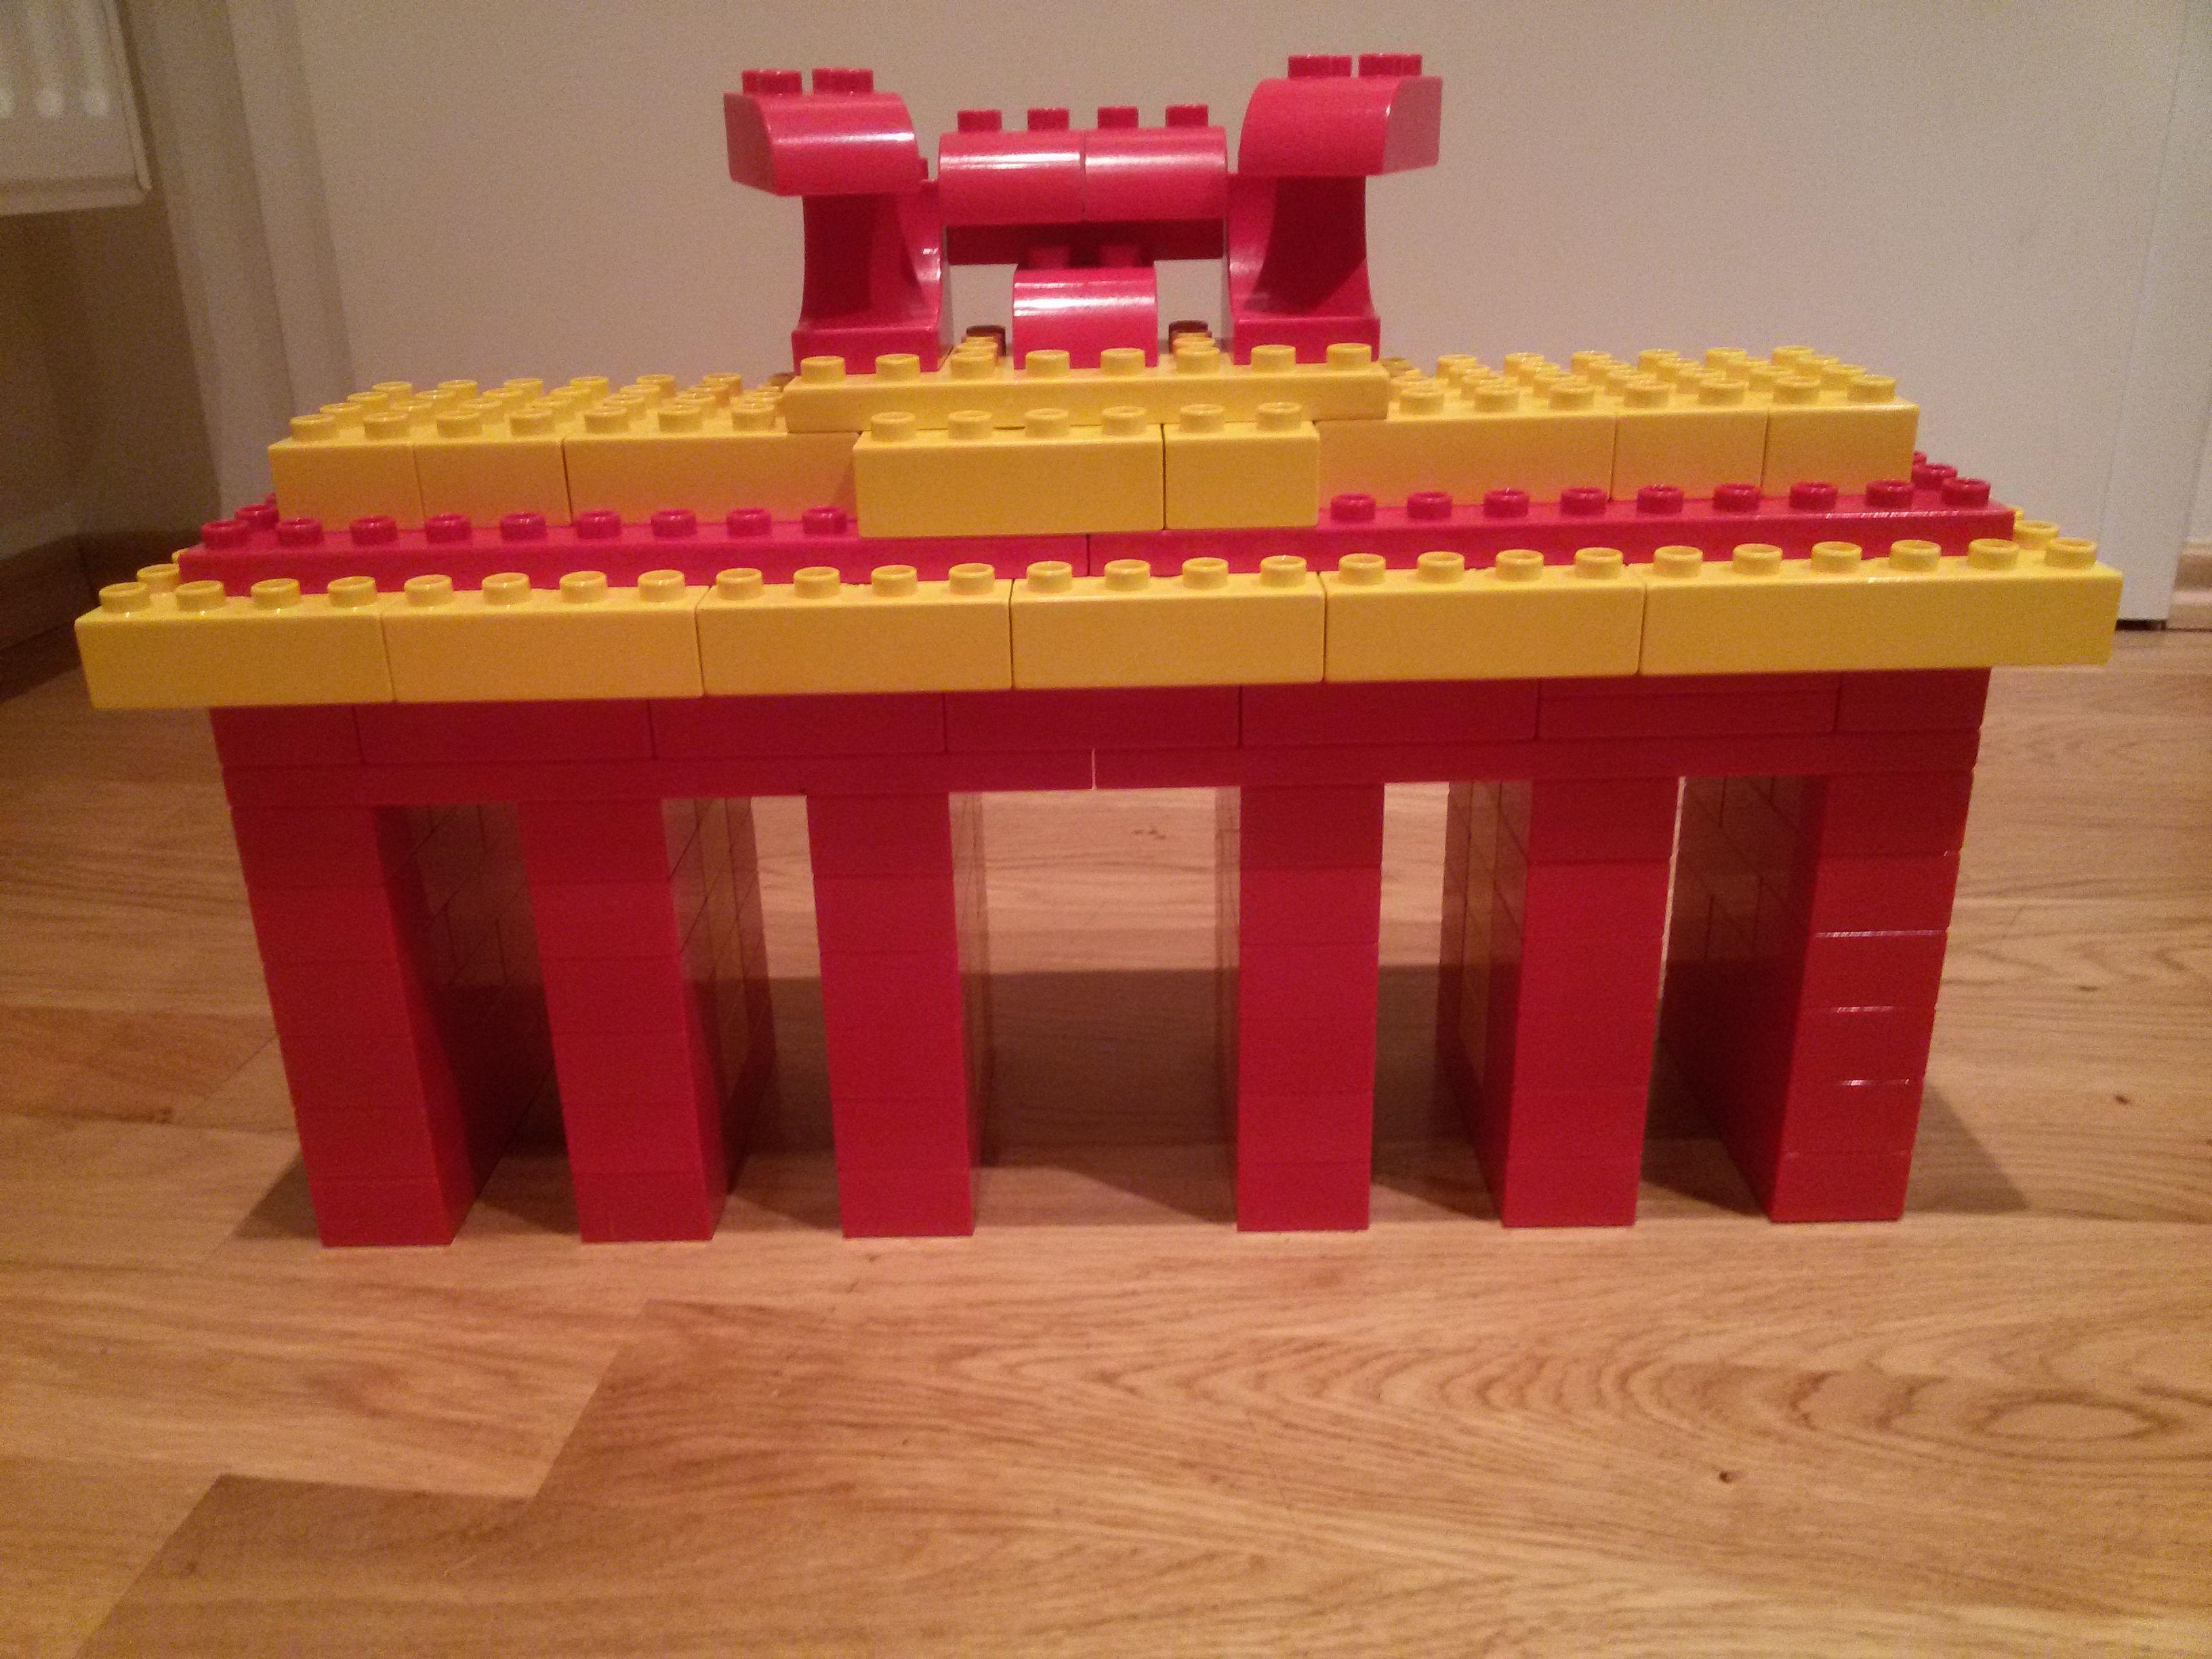 Pin Auf Bauideen Lego Duplo Bauwerke